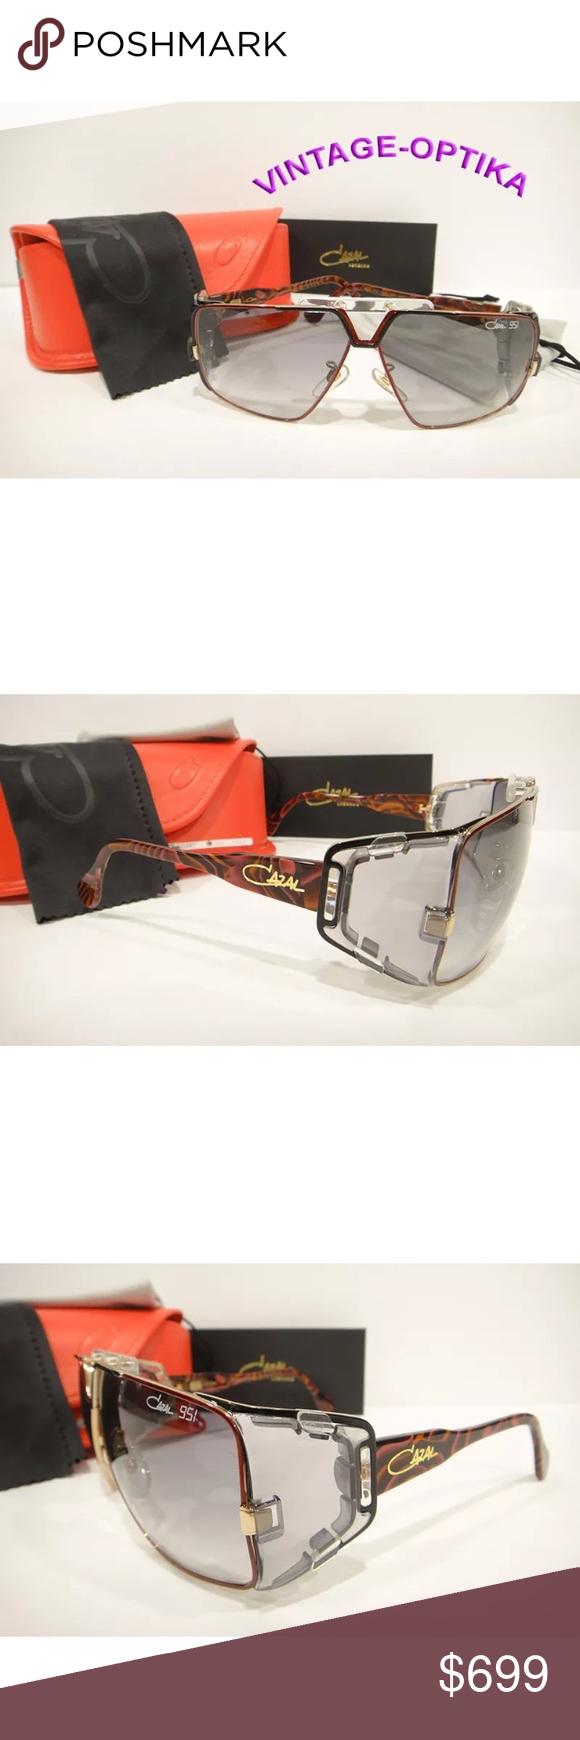 a9f4c0414c0 CAZAL 951 Sunglasses ANNIVERSARY Edition 002 New These are 100% Genuine